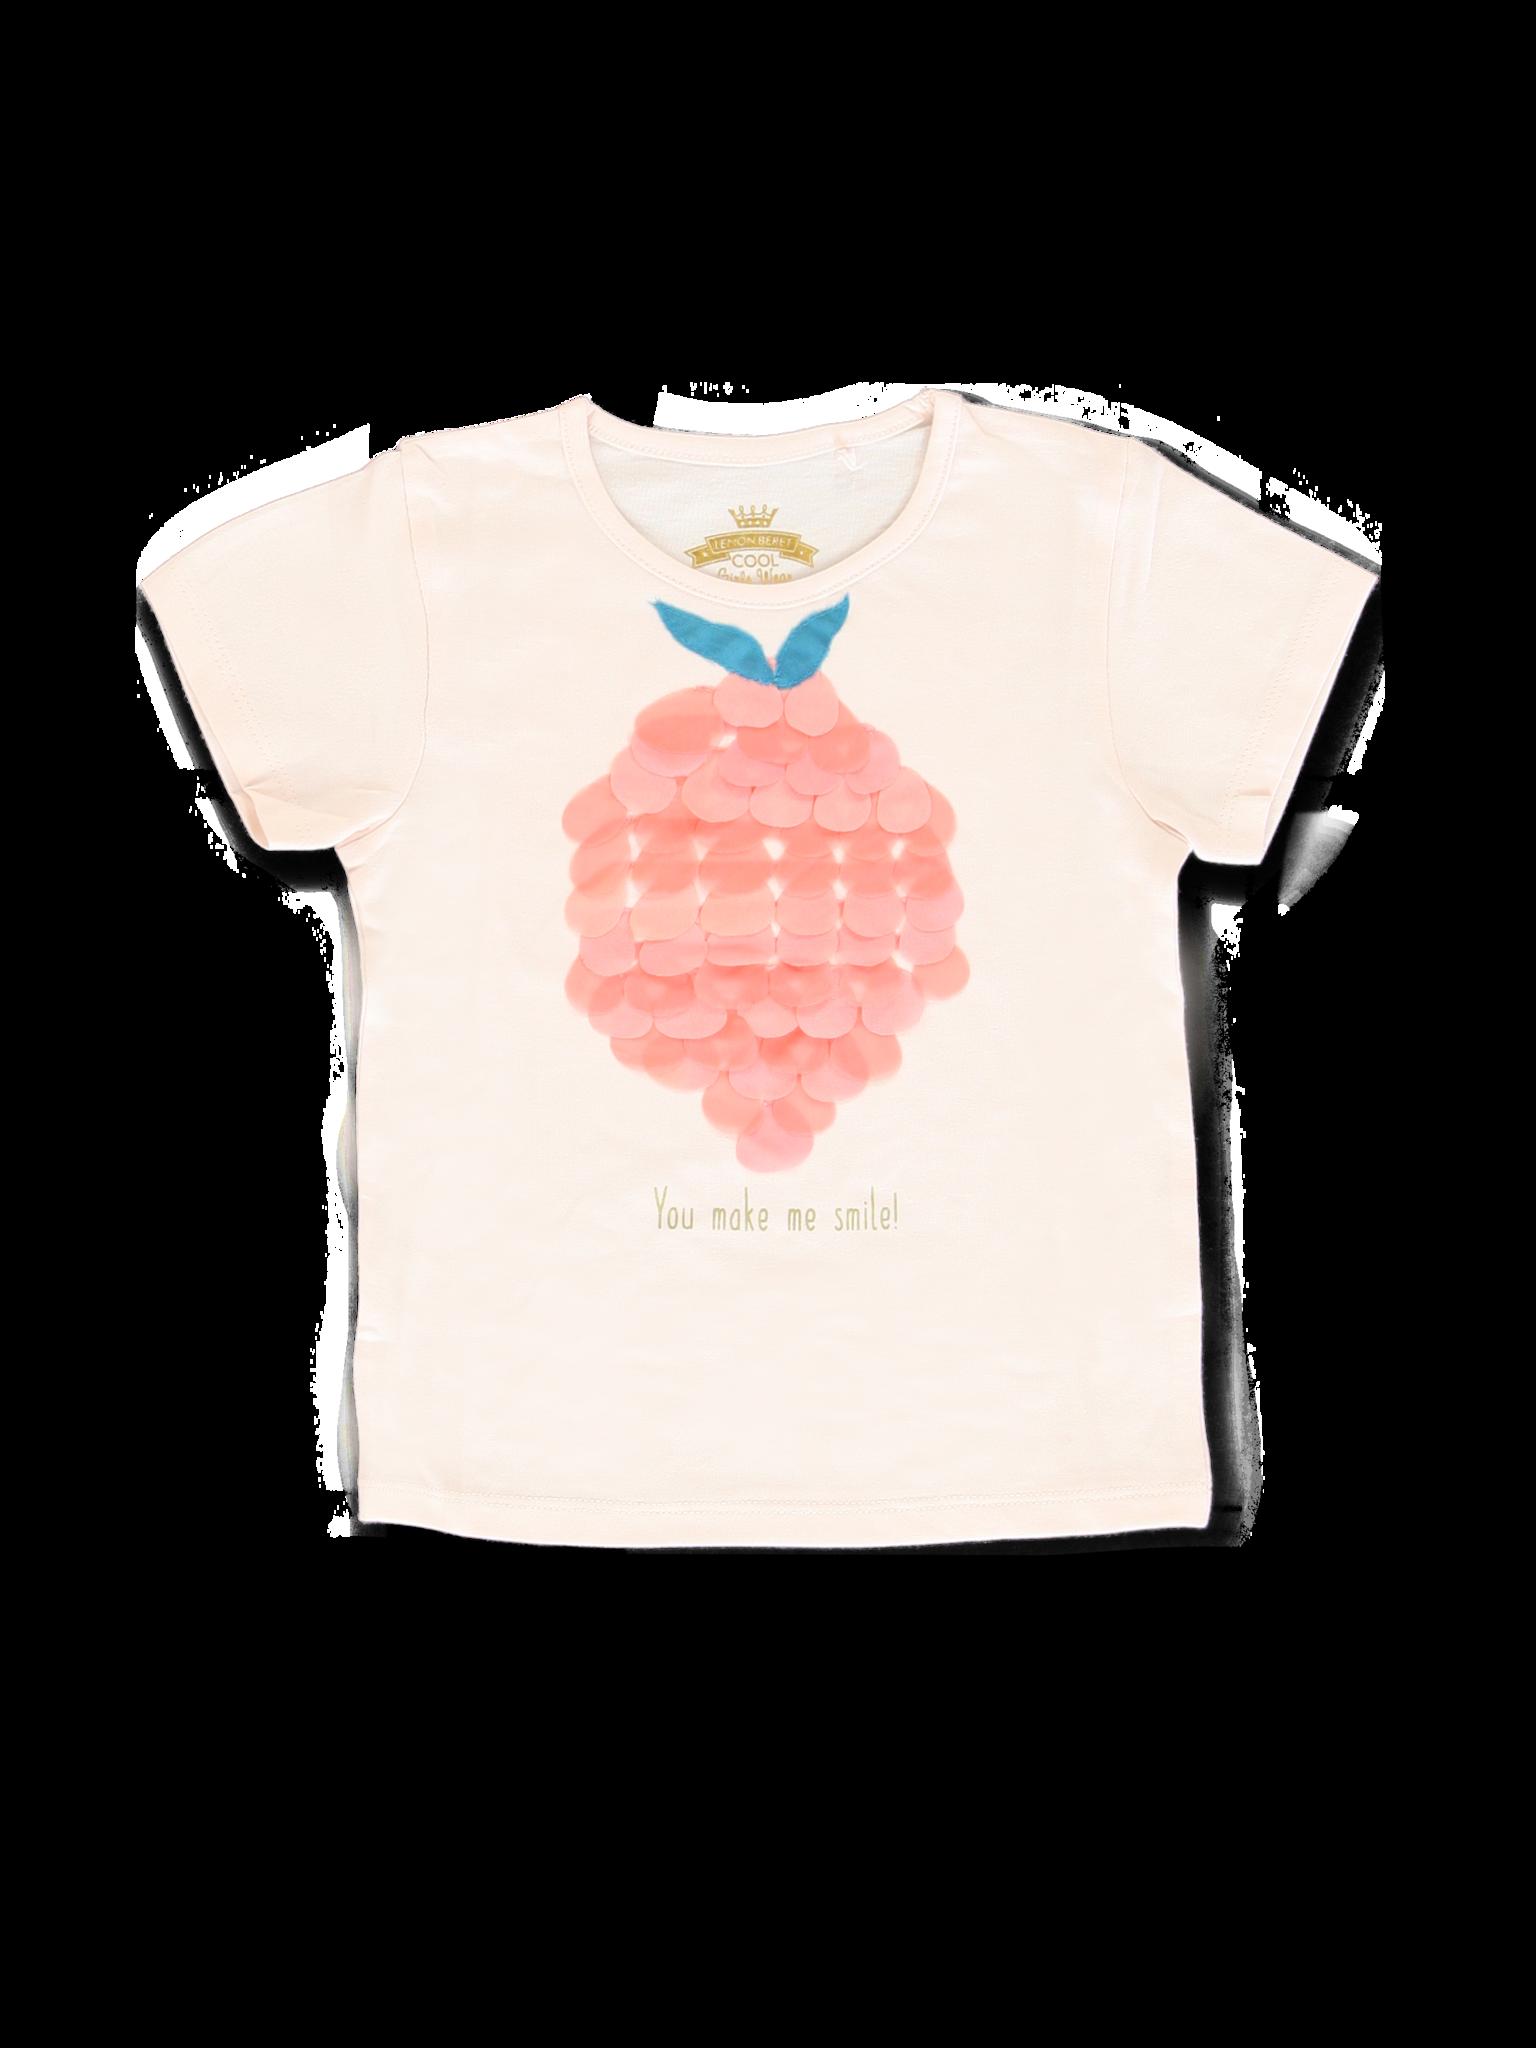 All Brands | Summerproducts Small Girls | T-shirt | 12 pcs/box